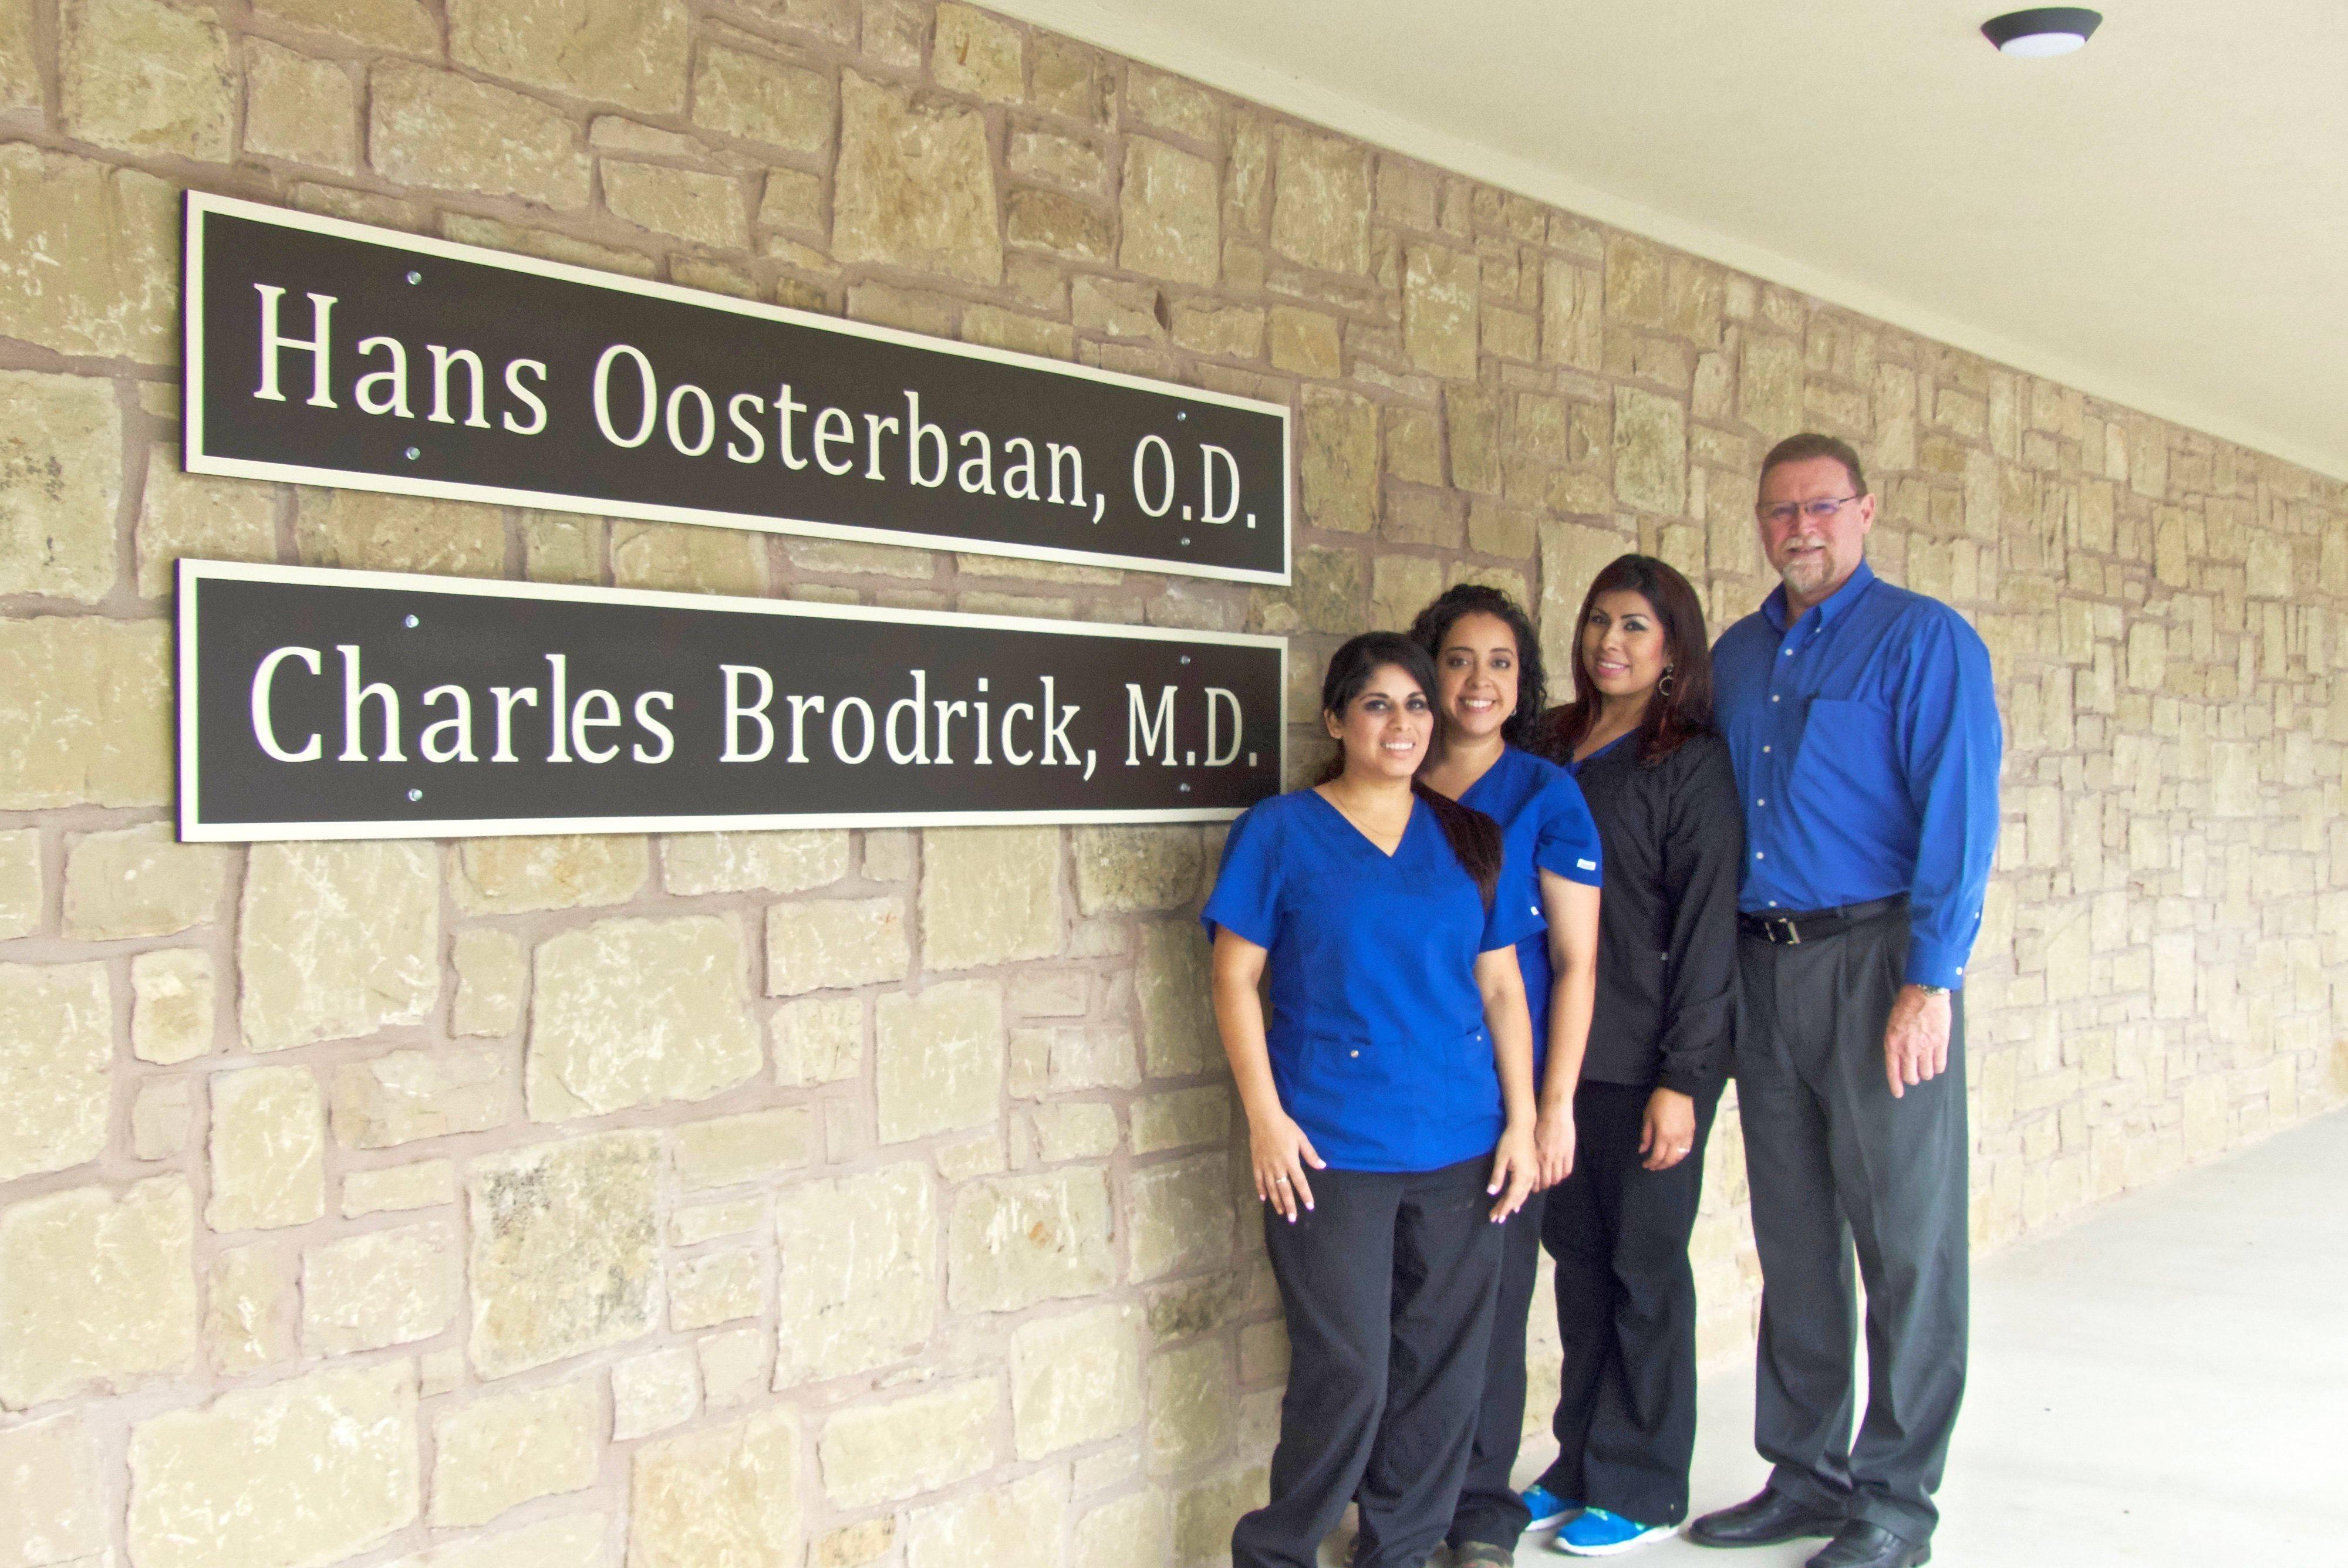 Dr.-Brodrick-and-staff-4-brighter